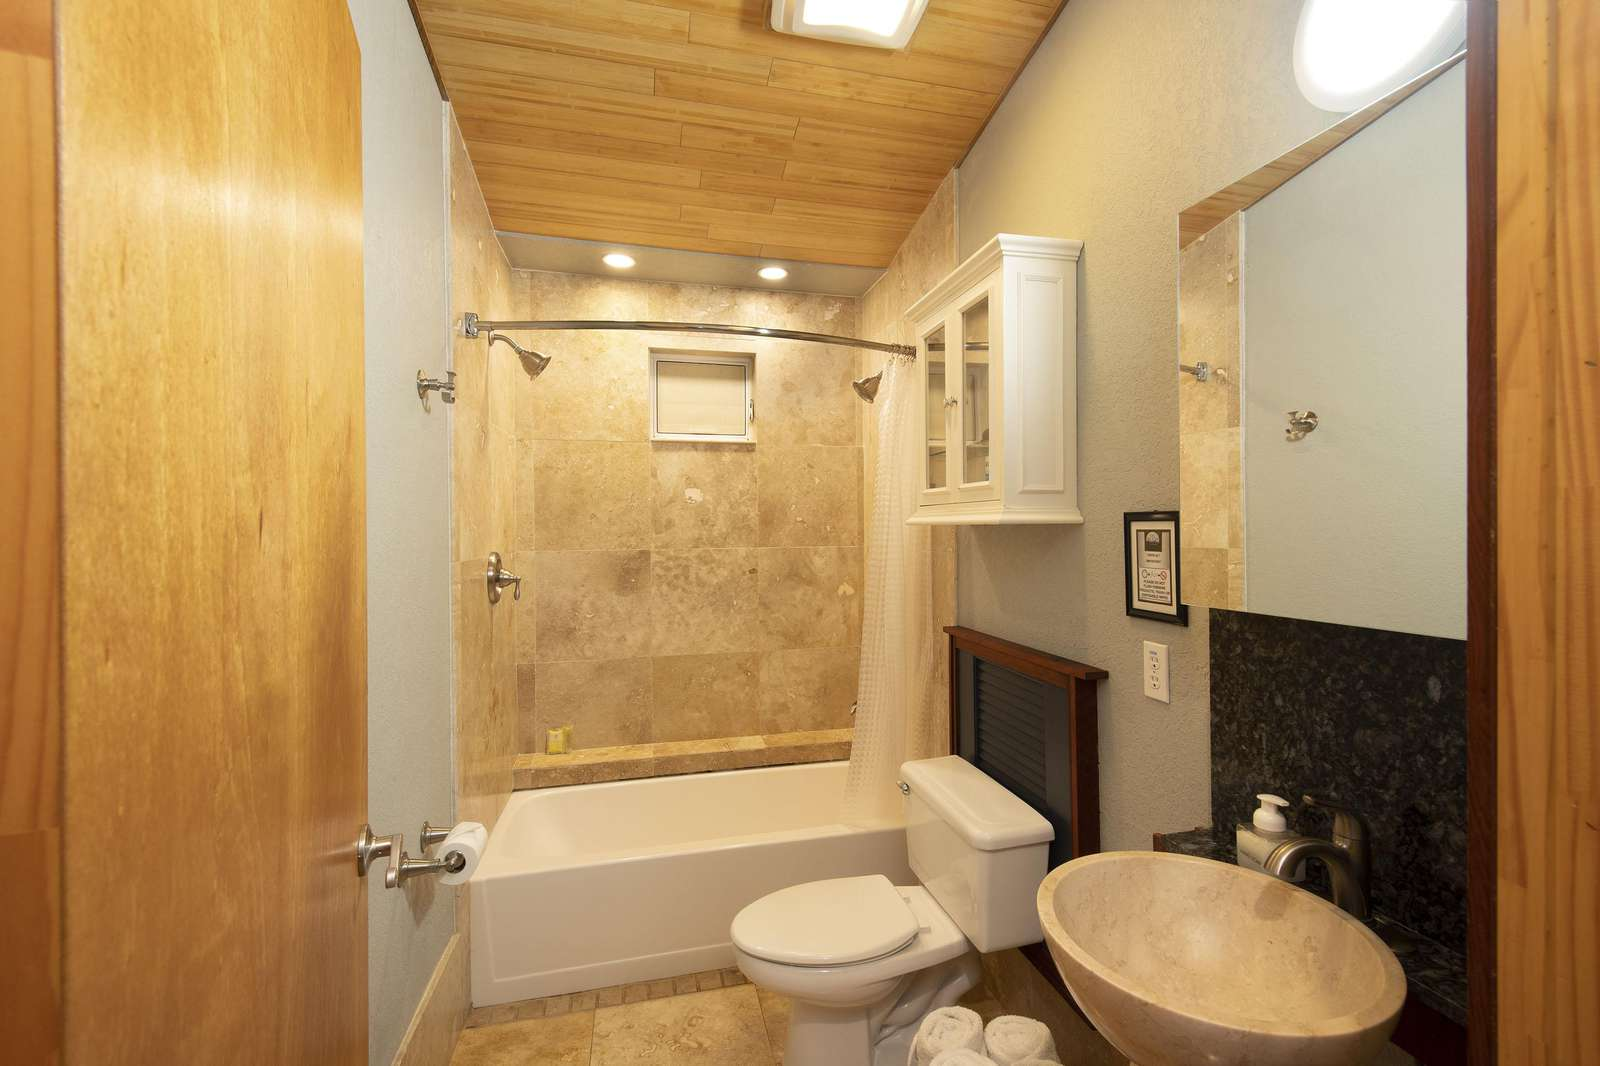 Bathroom tub with dual showerheads.